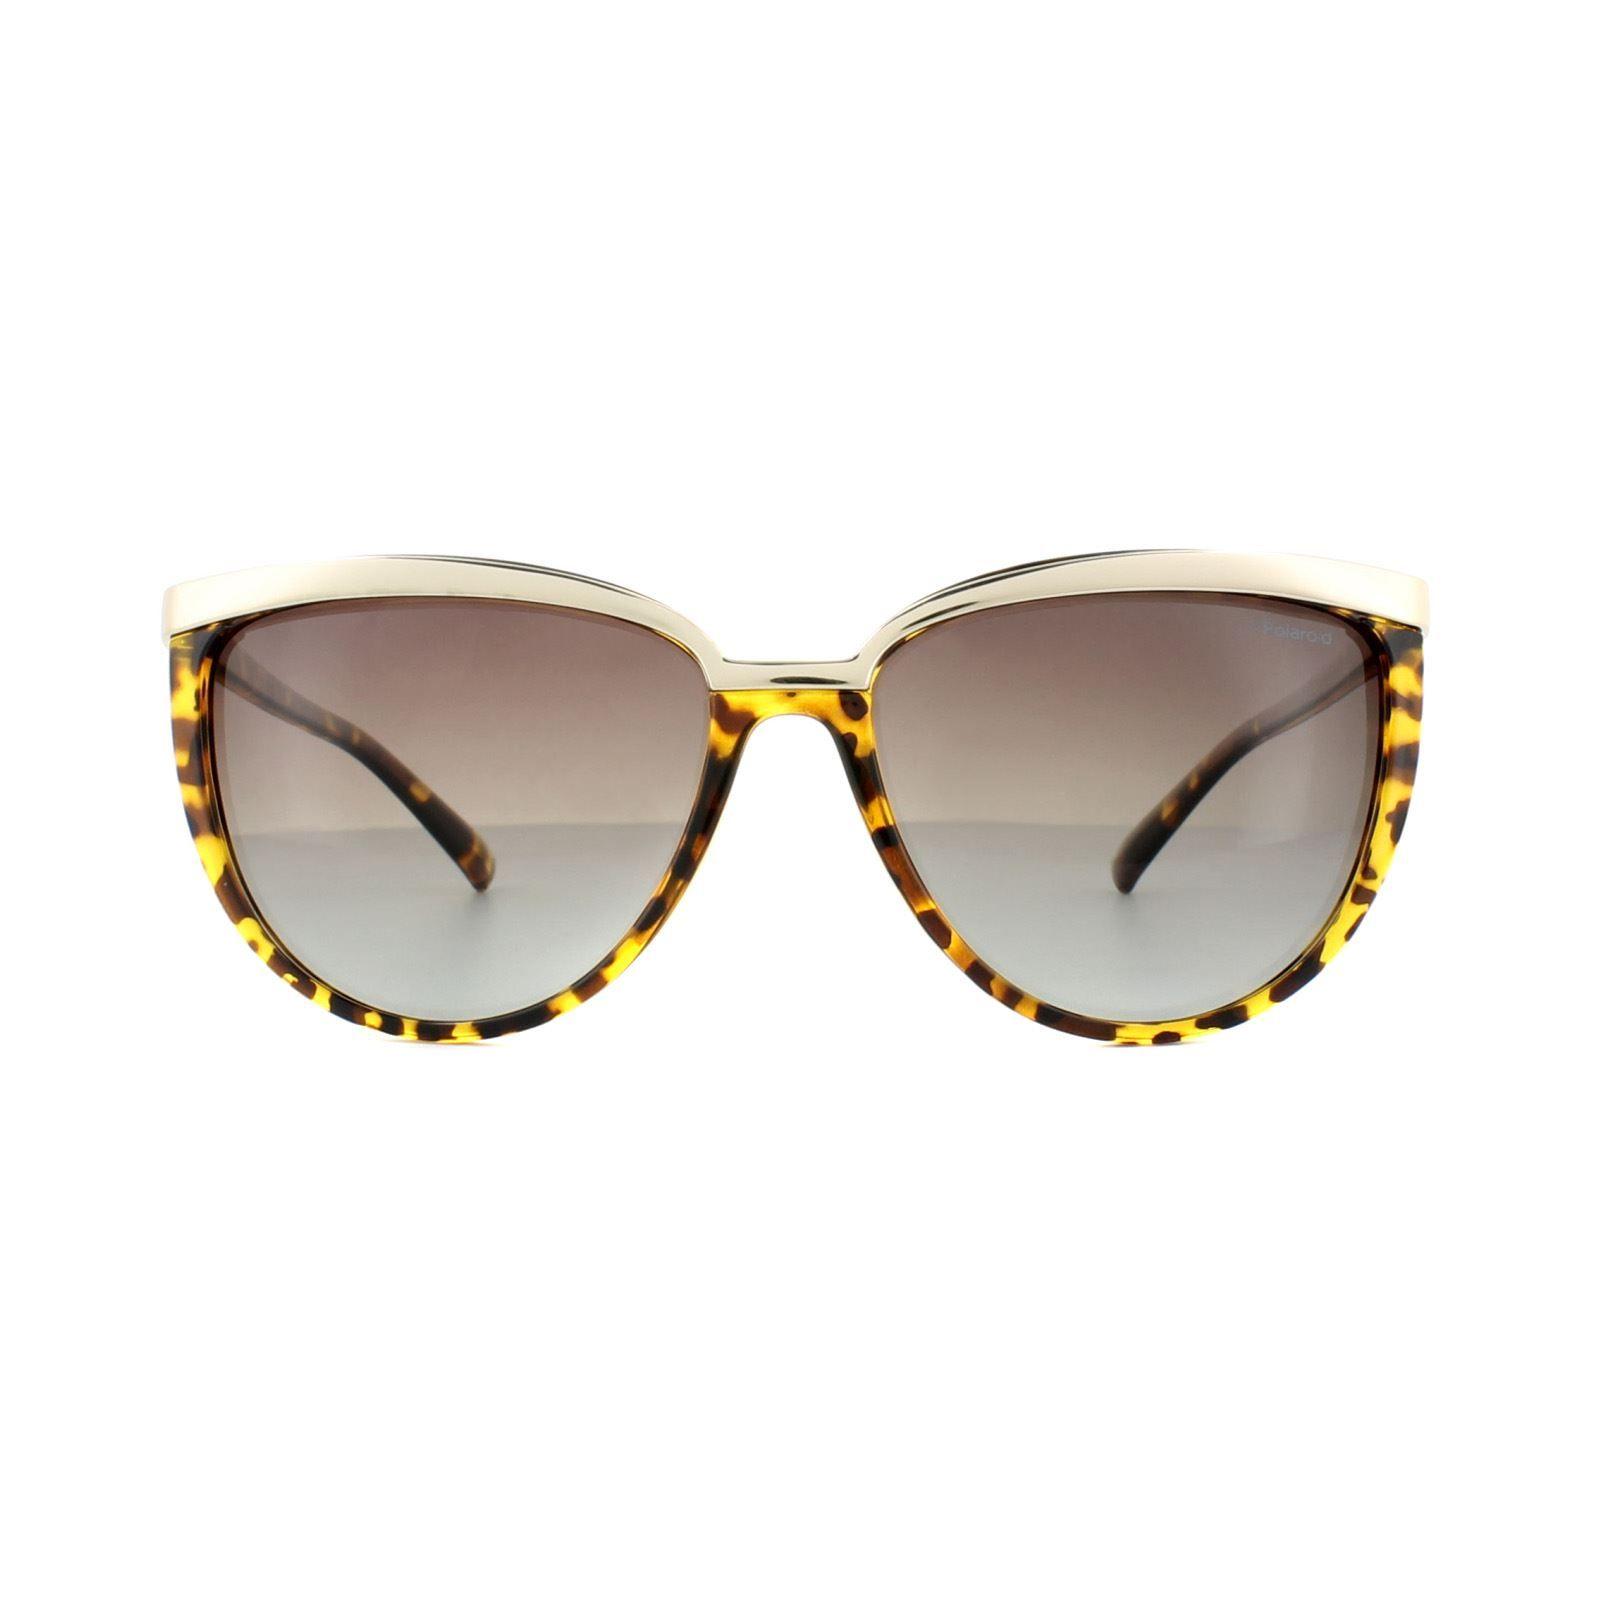 Polaroid Sunglasses 4016/S V08 LA Havana Gold Brown Gradient Polarized